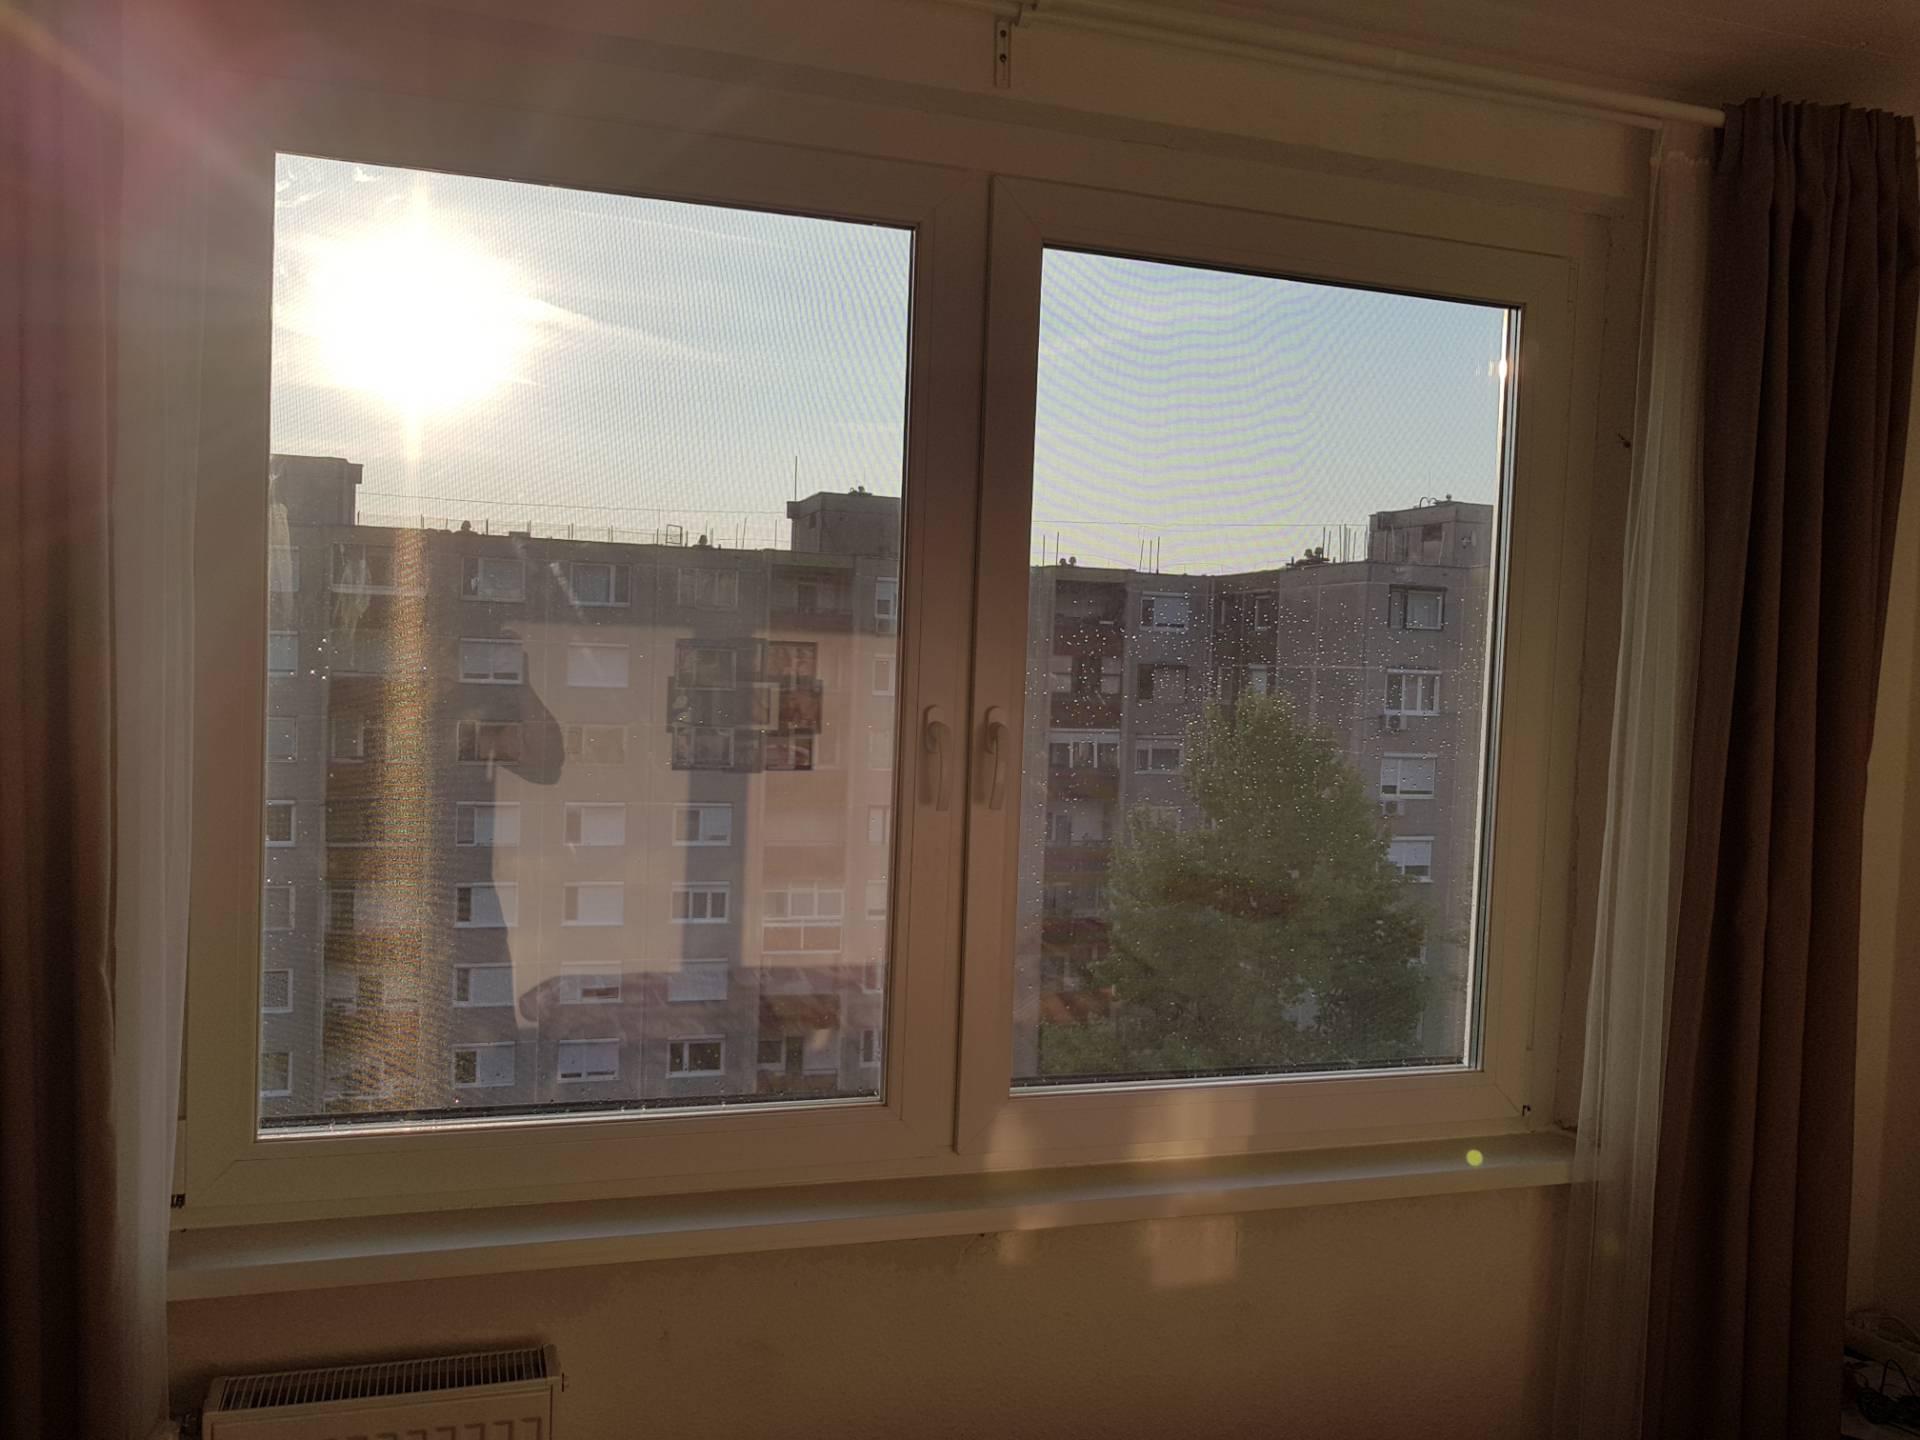 Gyönyörű új modern ablak